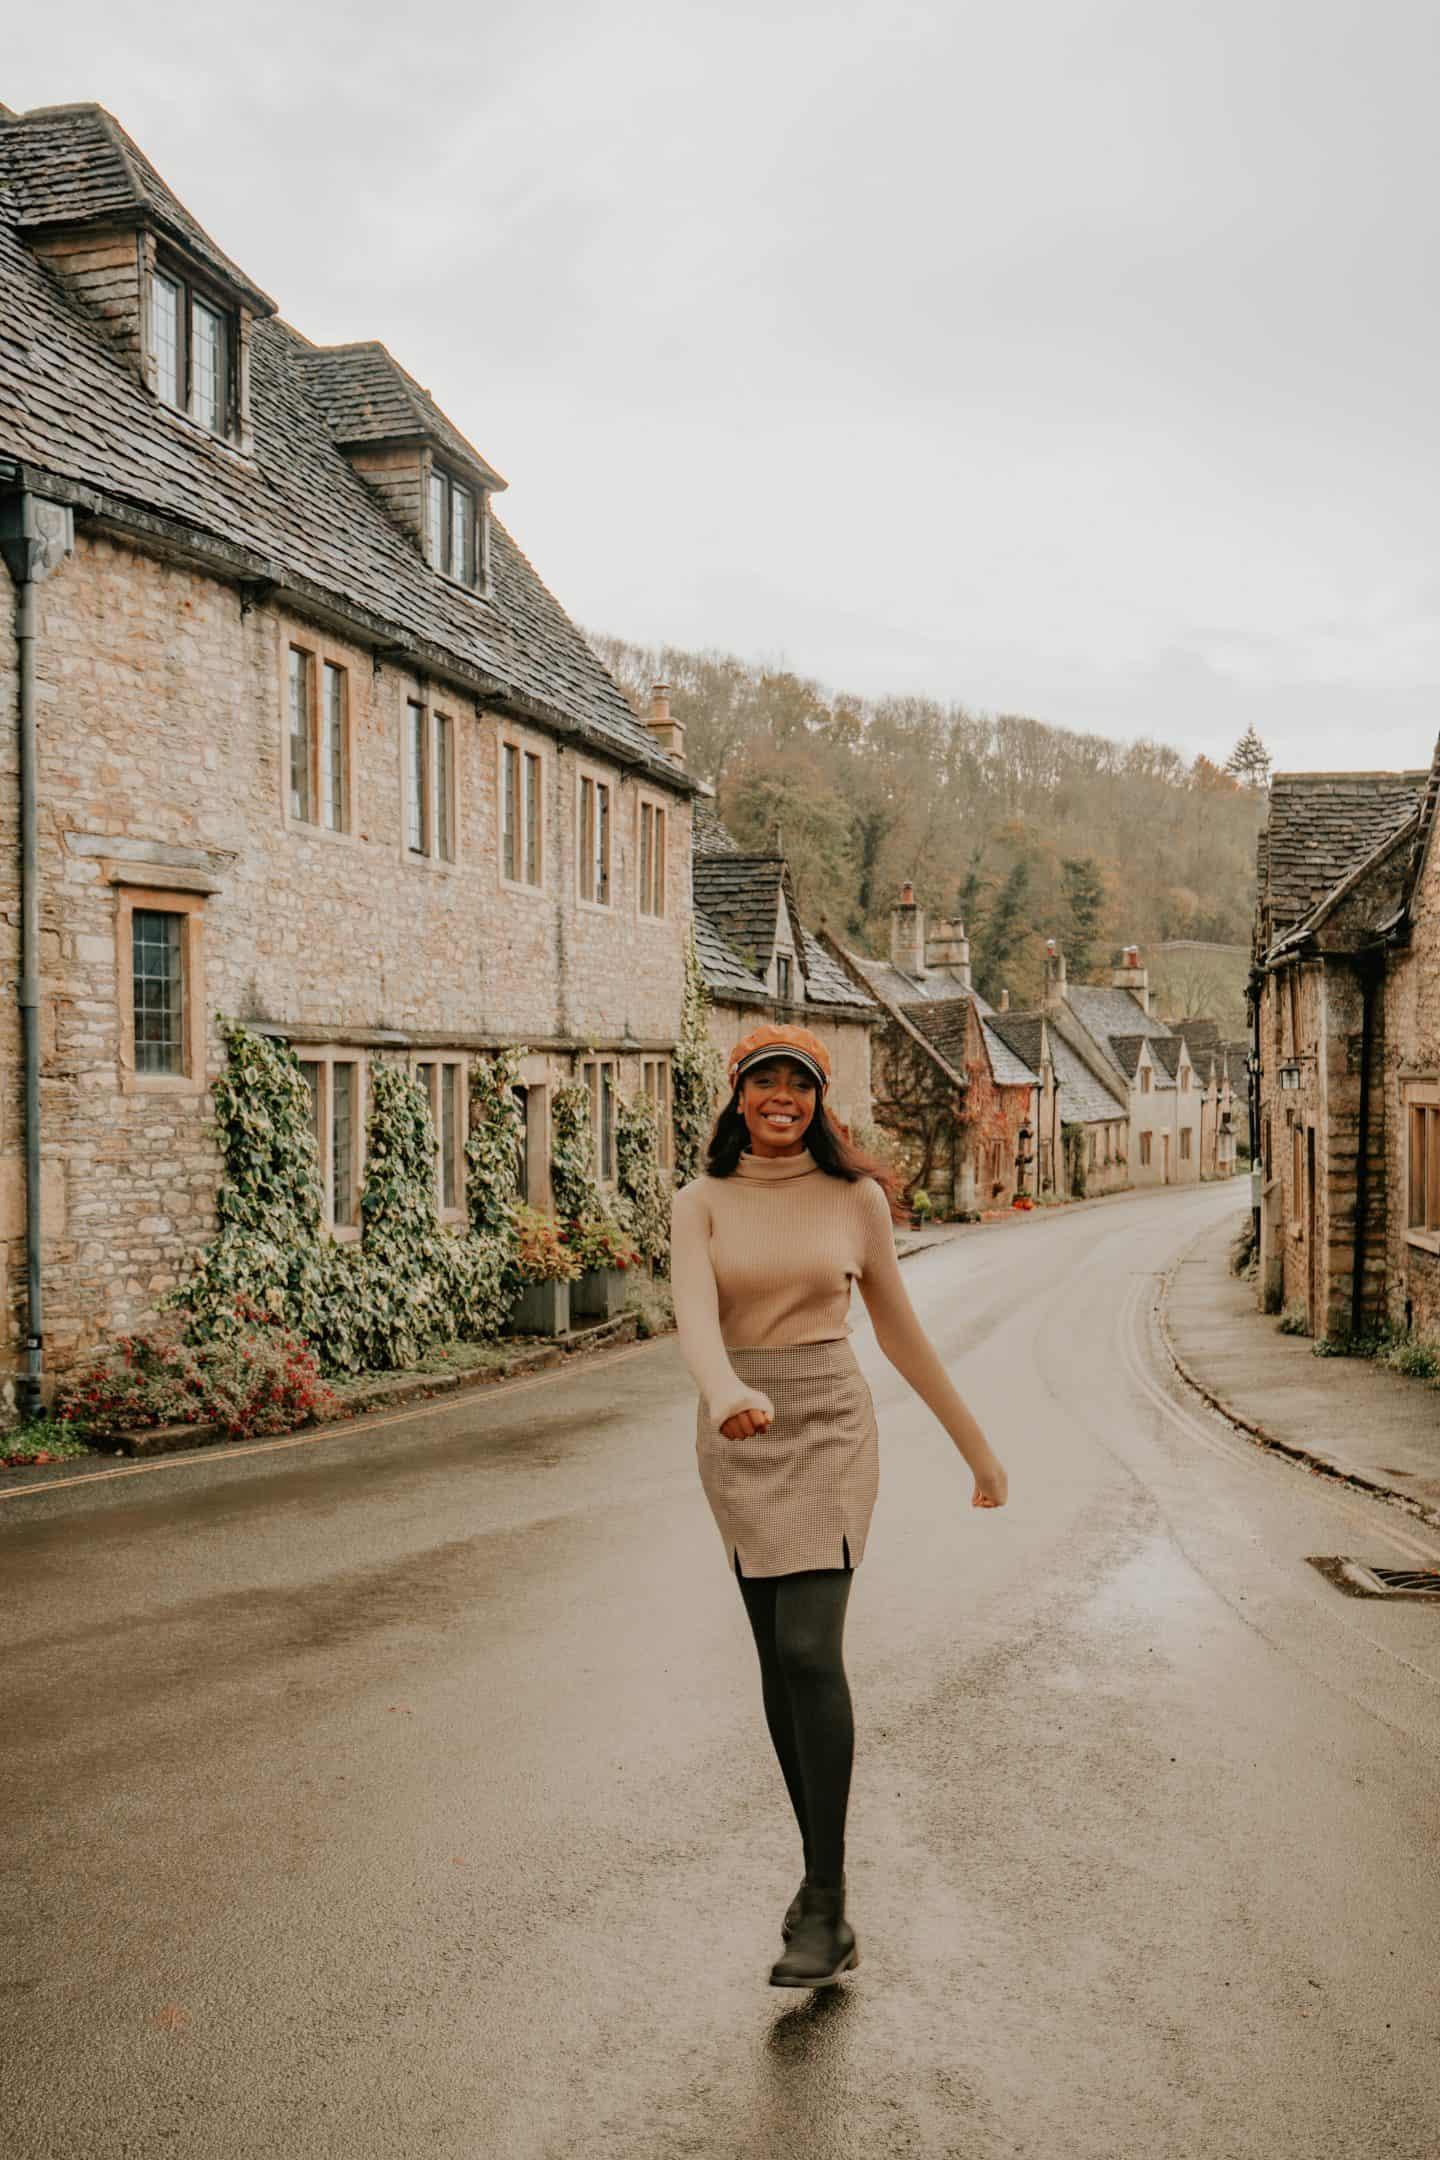 Prettiest Village in England, Castle Combe Cotswolds